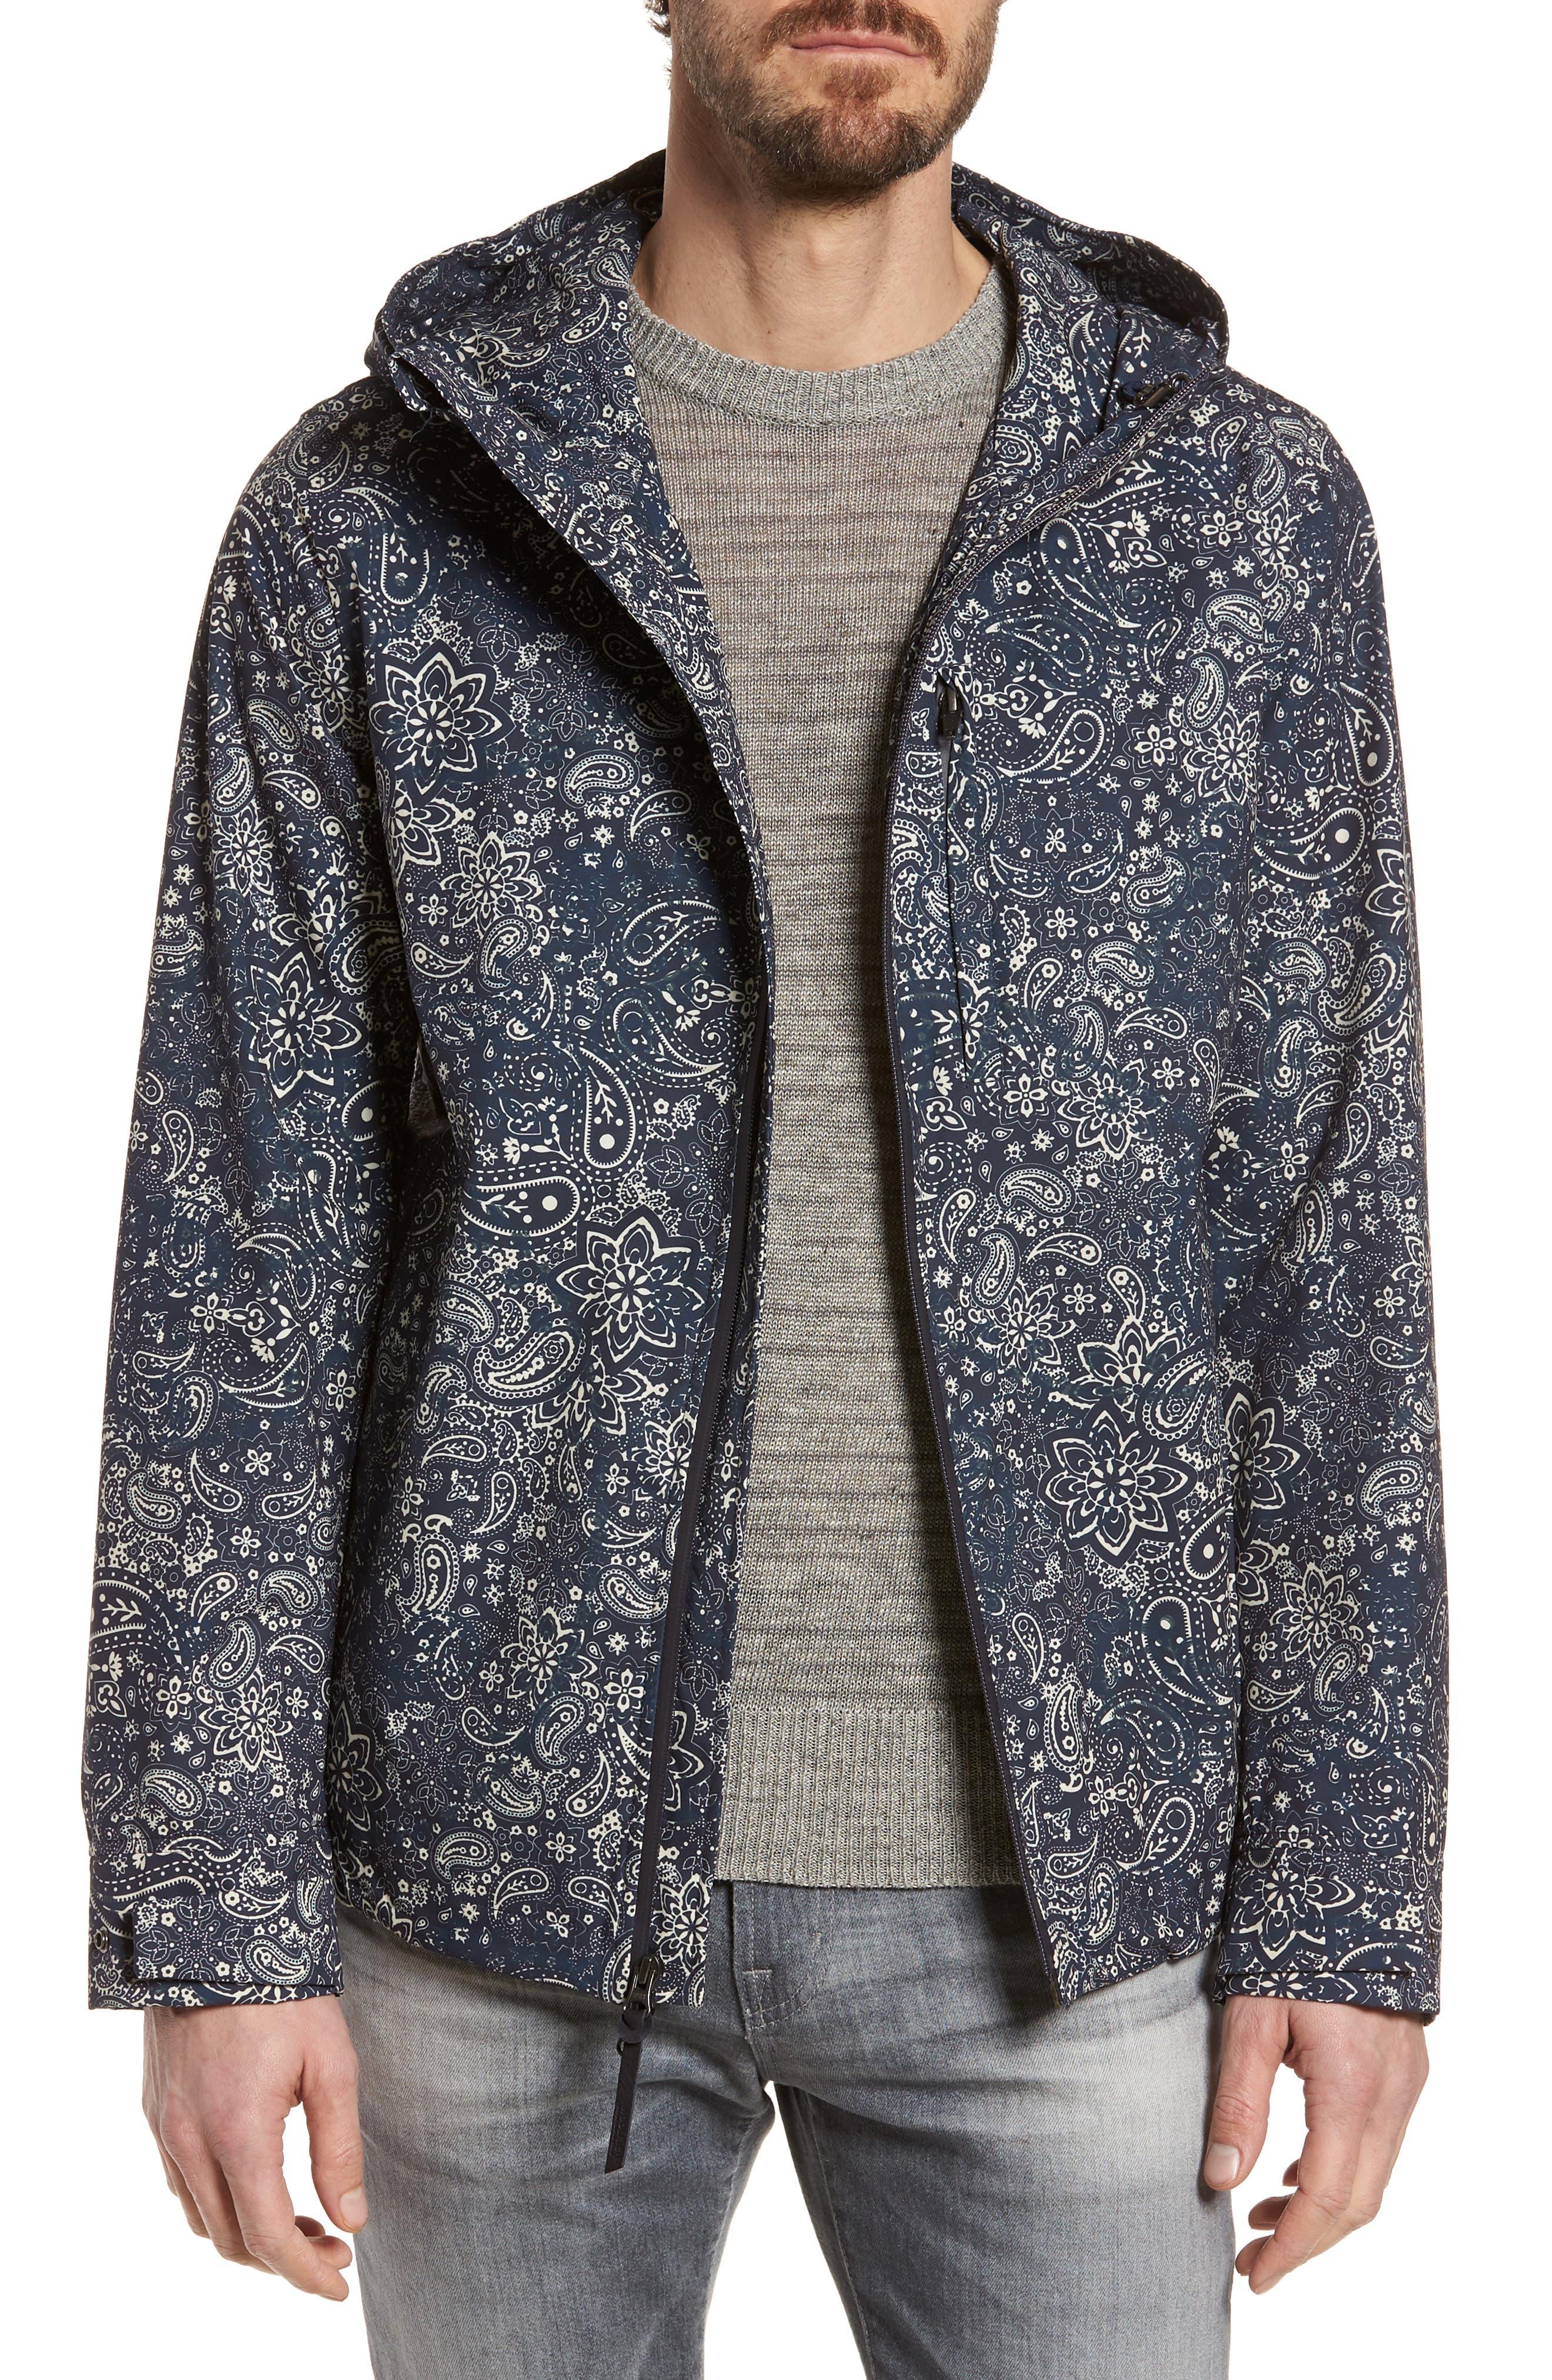 & Bros. Southbay Jacket,                         Main,                         color,